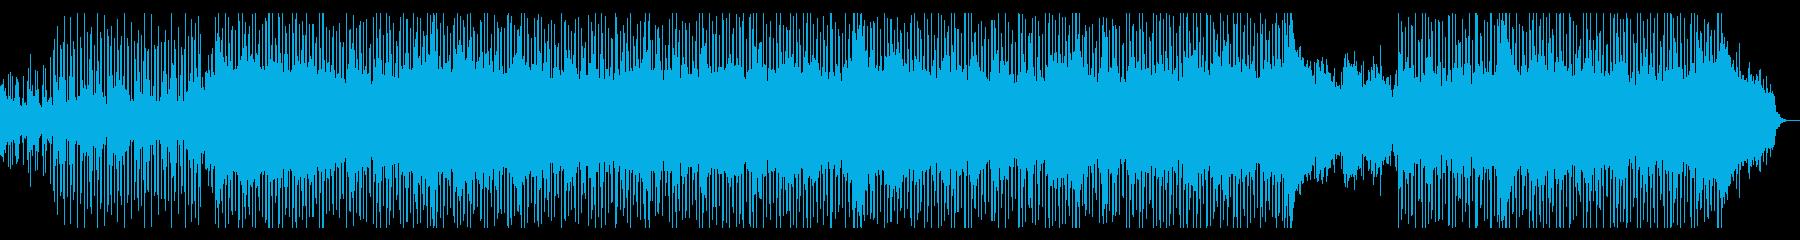 135bpm Corporate Energetic Rock Motivational's reproduced waveform